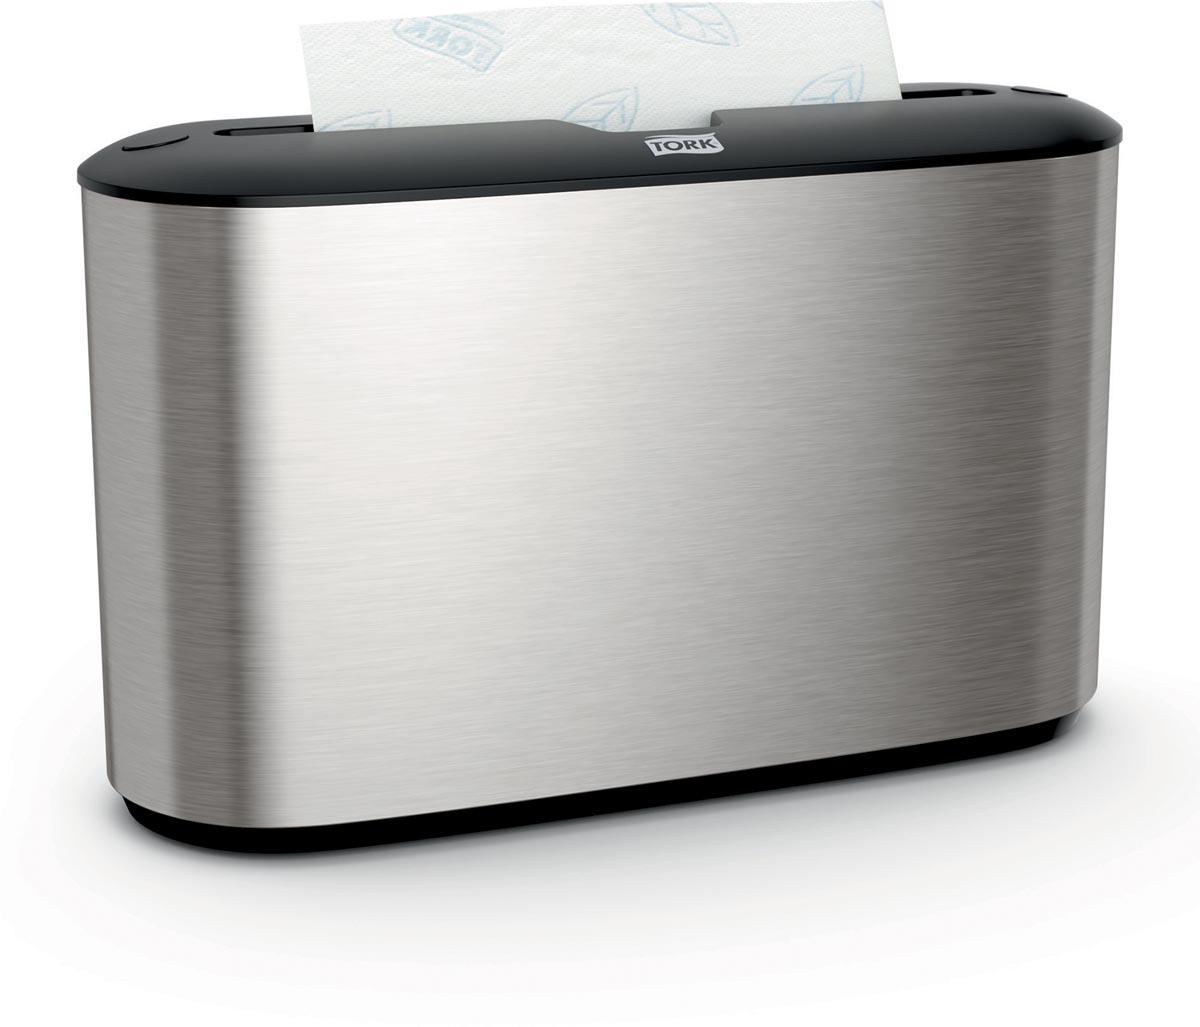 Tork Xpress handdoekdispenser multifold, countertop, systeem H2, inox